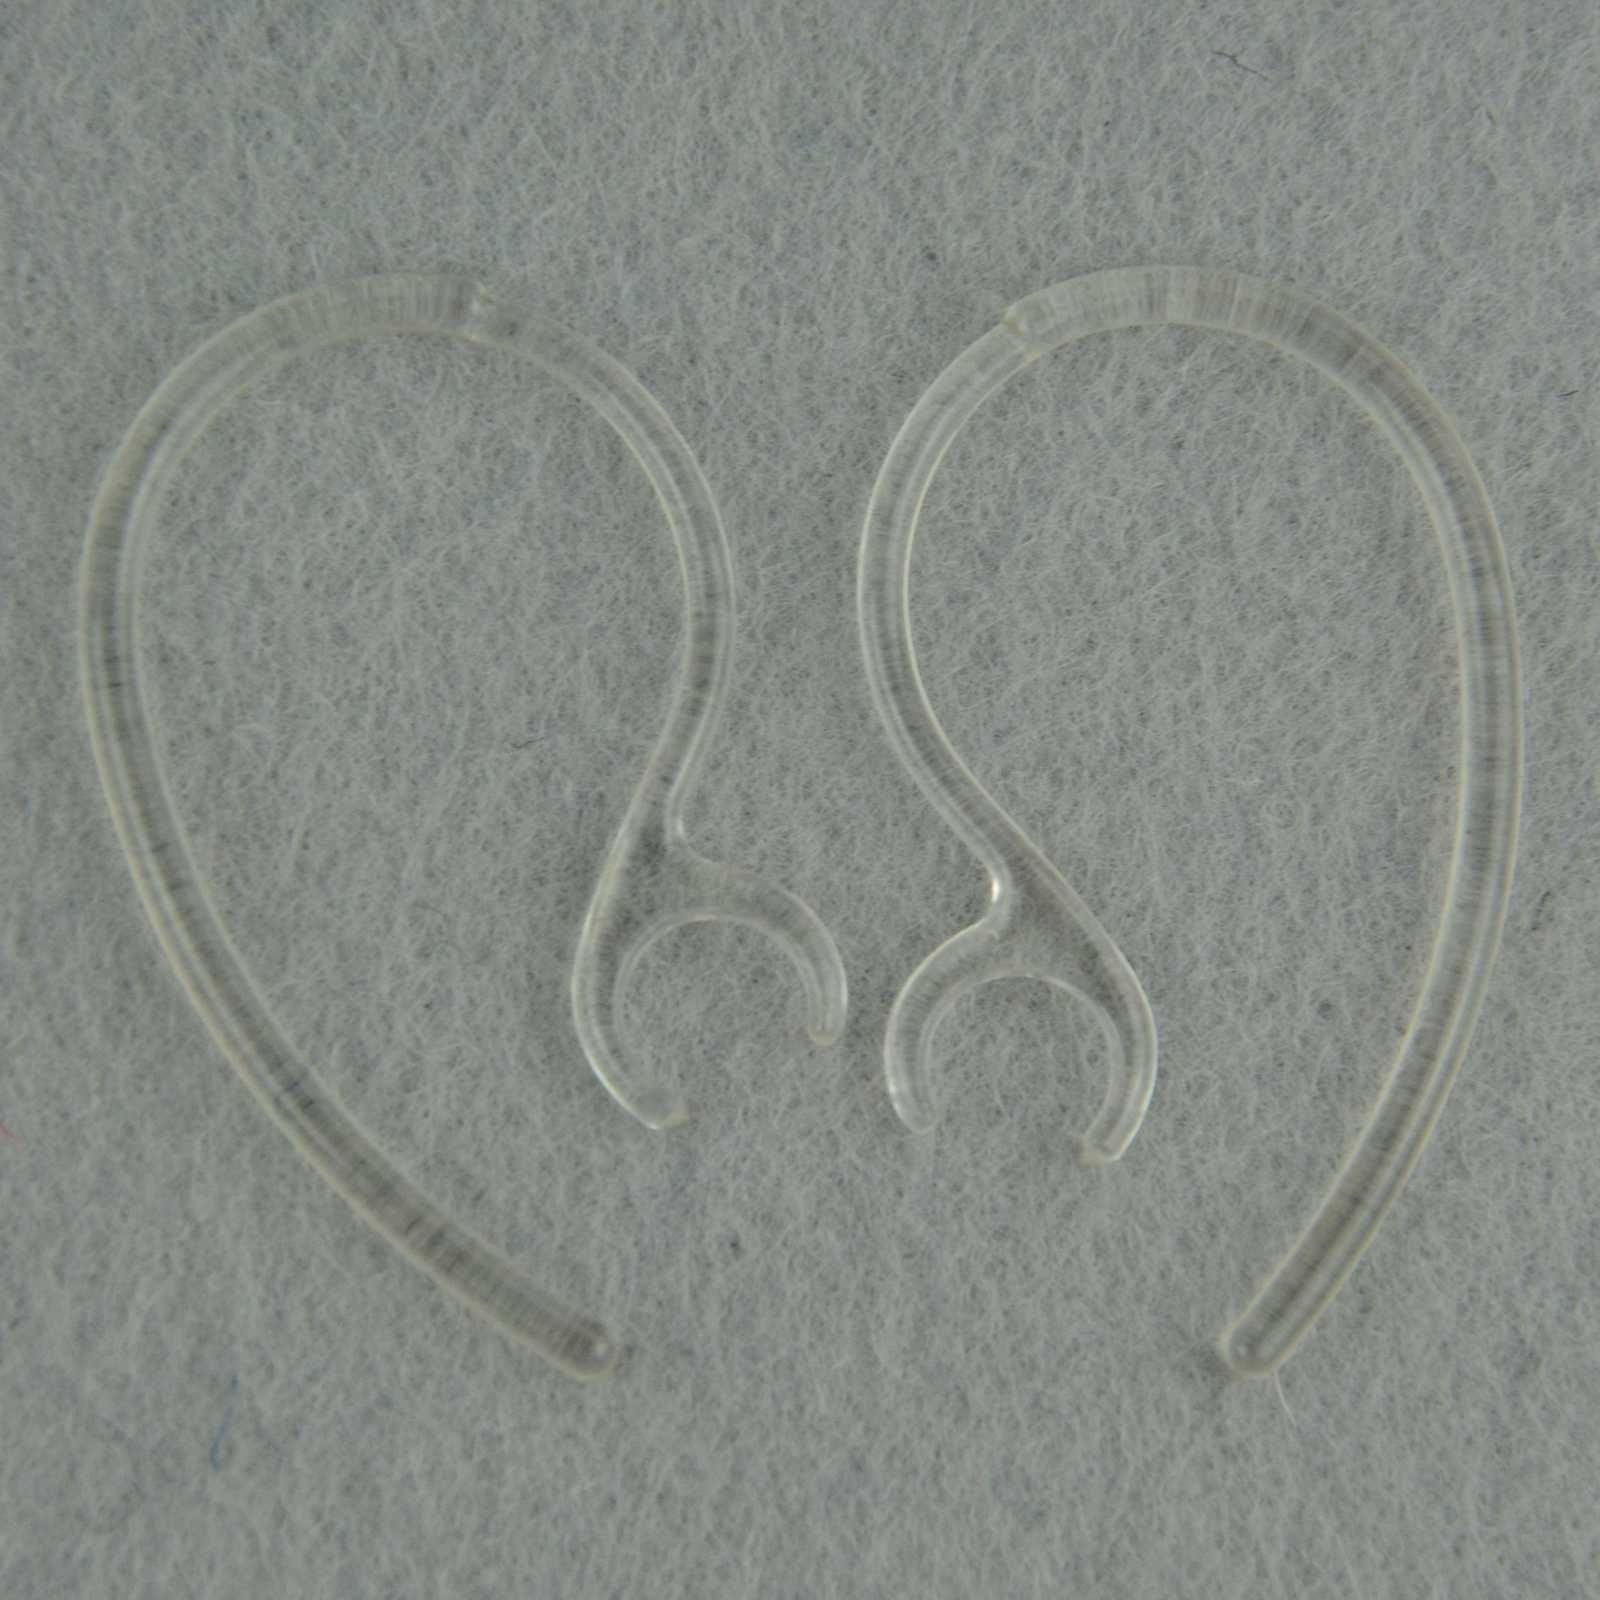 New Ear Hook Ear Bud Gels for Jabra EASYGO EASYCALL CLEAR TALK Bluetooth Headset